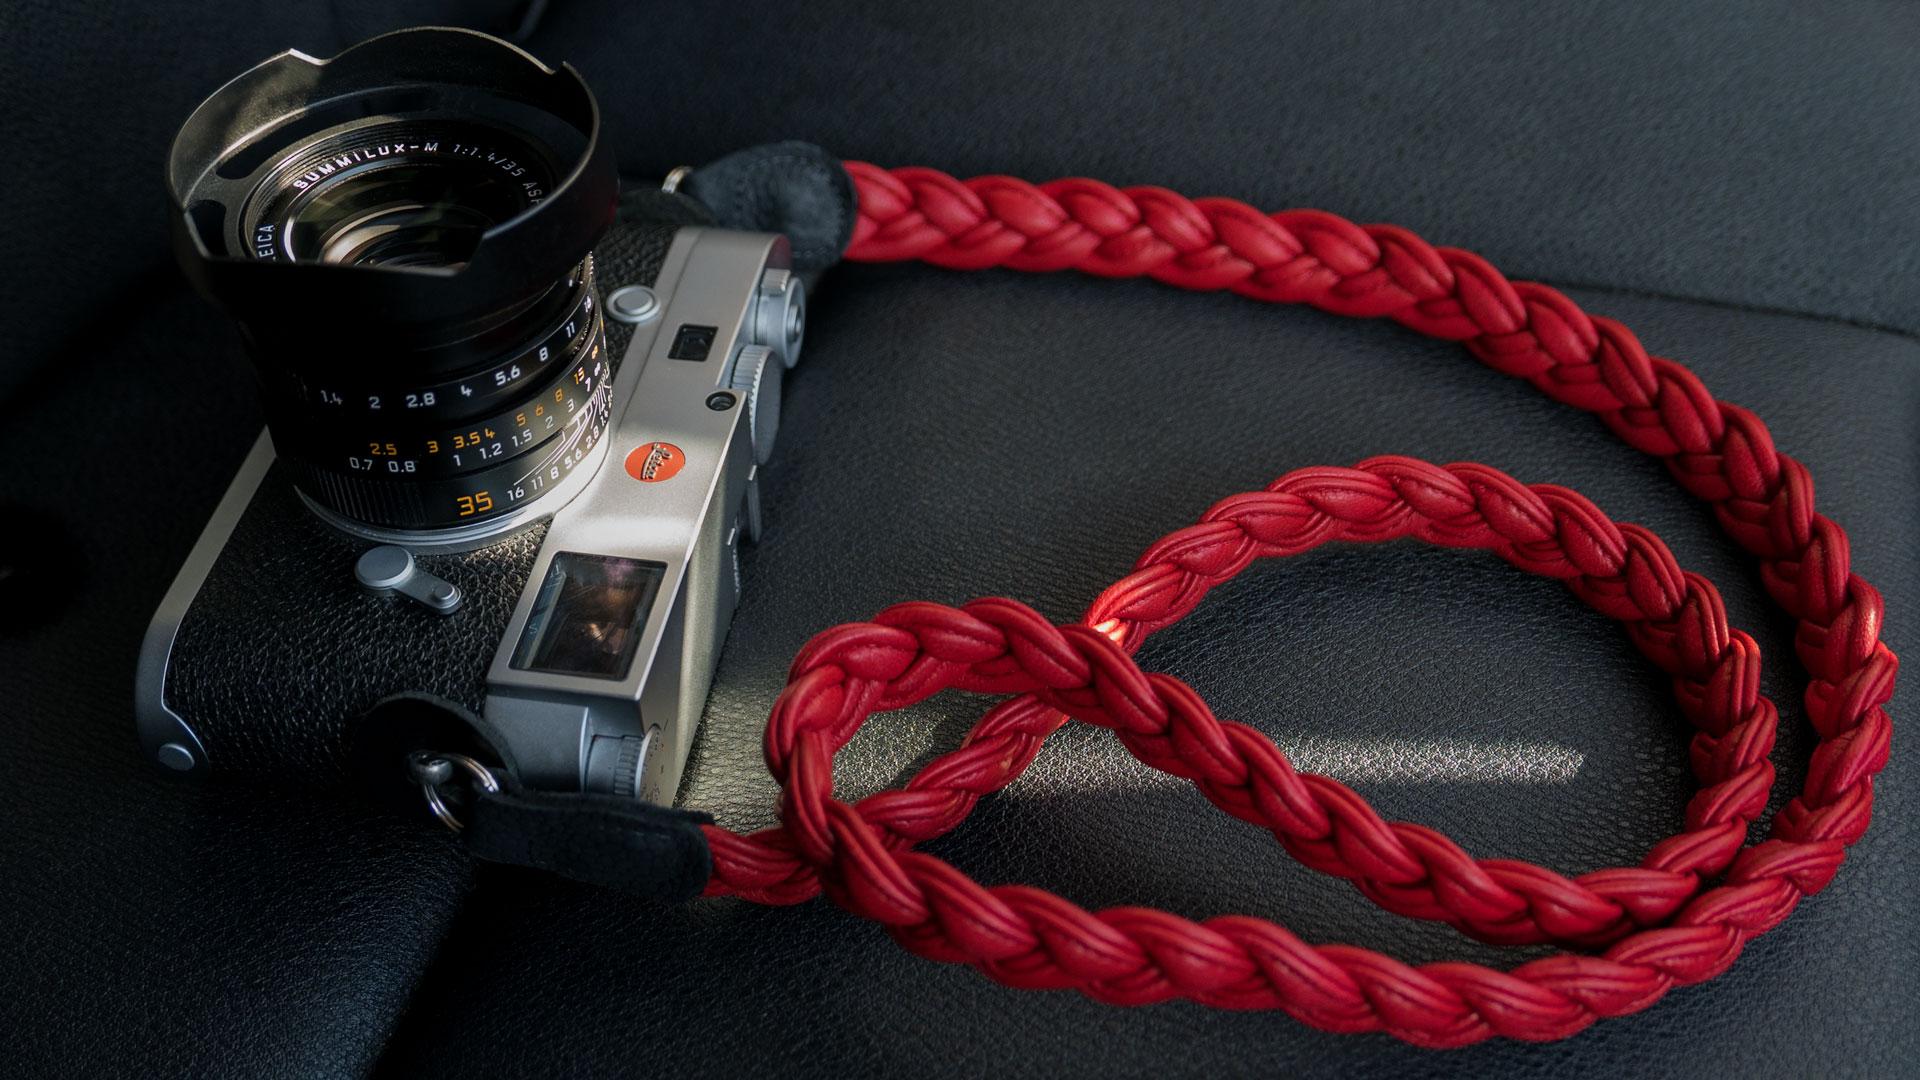 leica m strap, leather camera strap, handmade leather camera strap, leica camera strap, mirrorless camera strap, handmade camera strap, red camera strap, braided camera strap